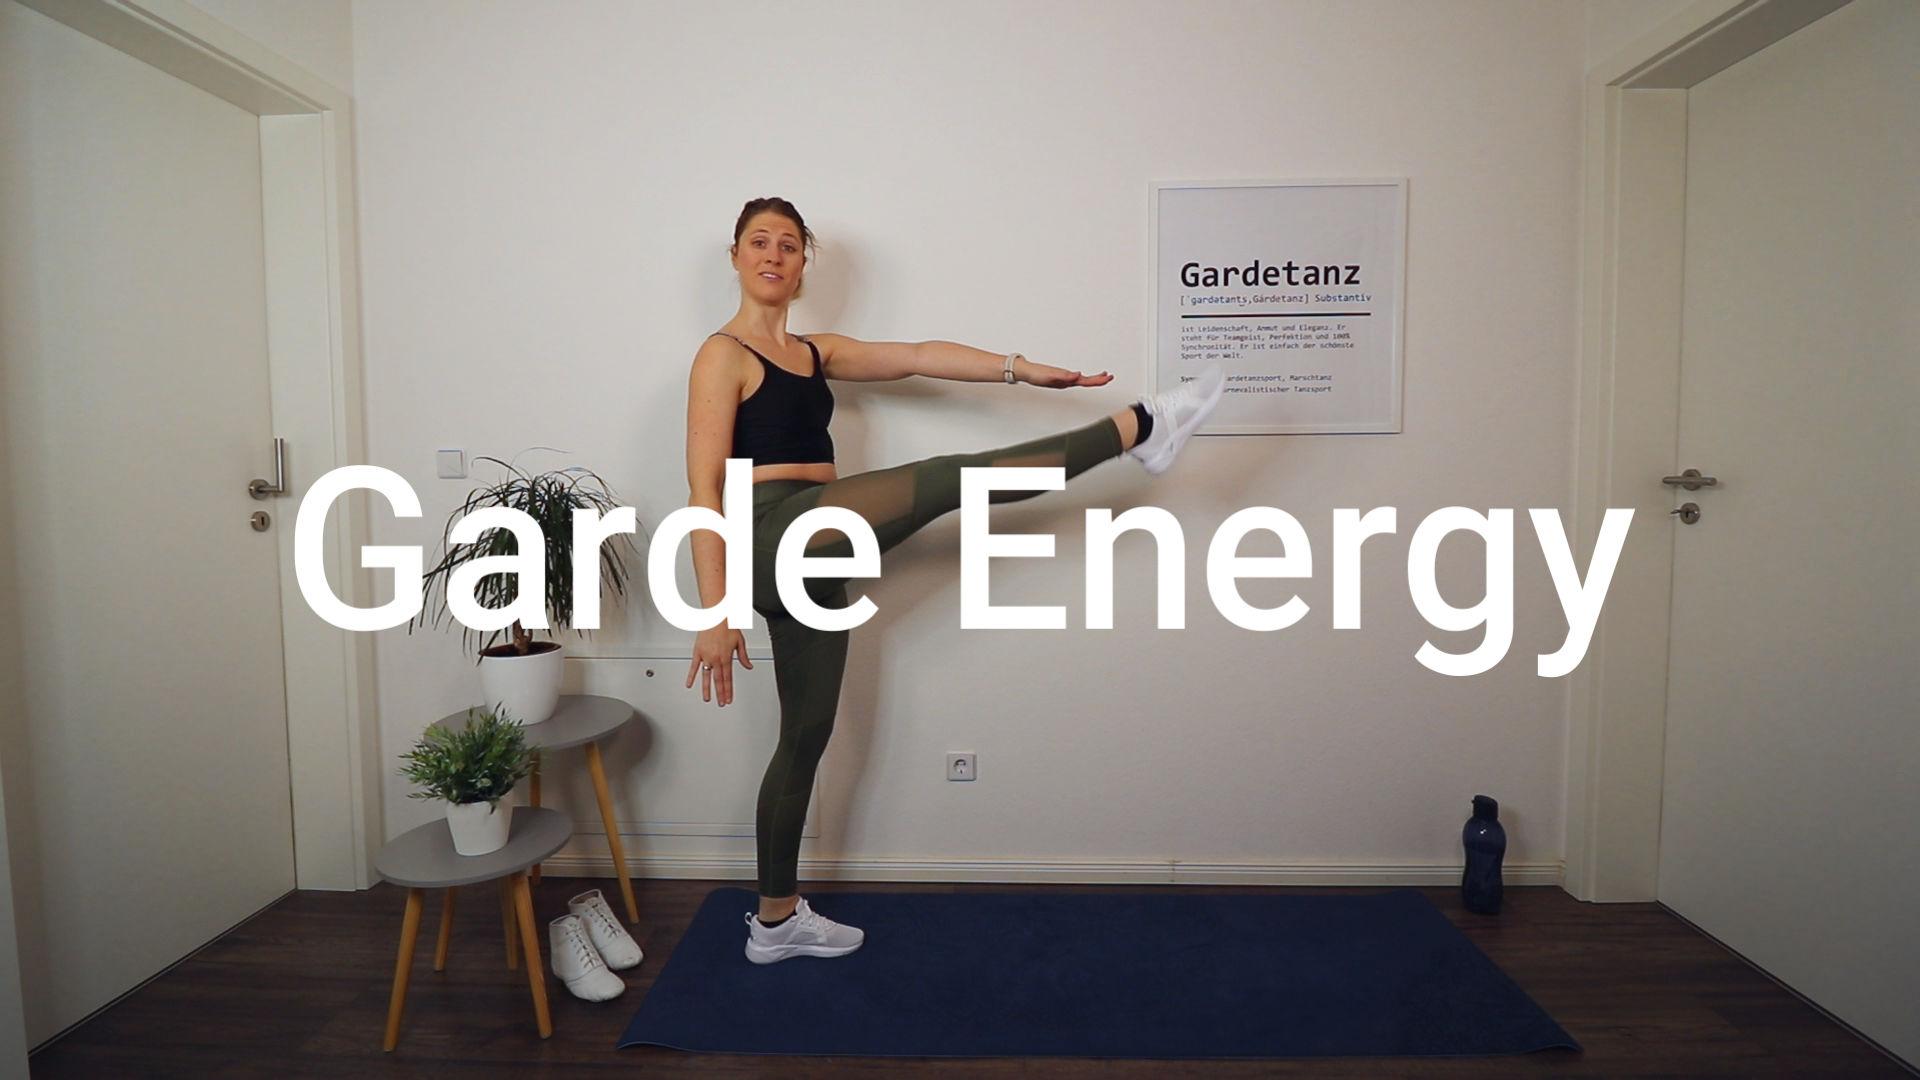 Gardesports | Garde Energy Schnuppertraining